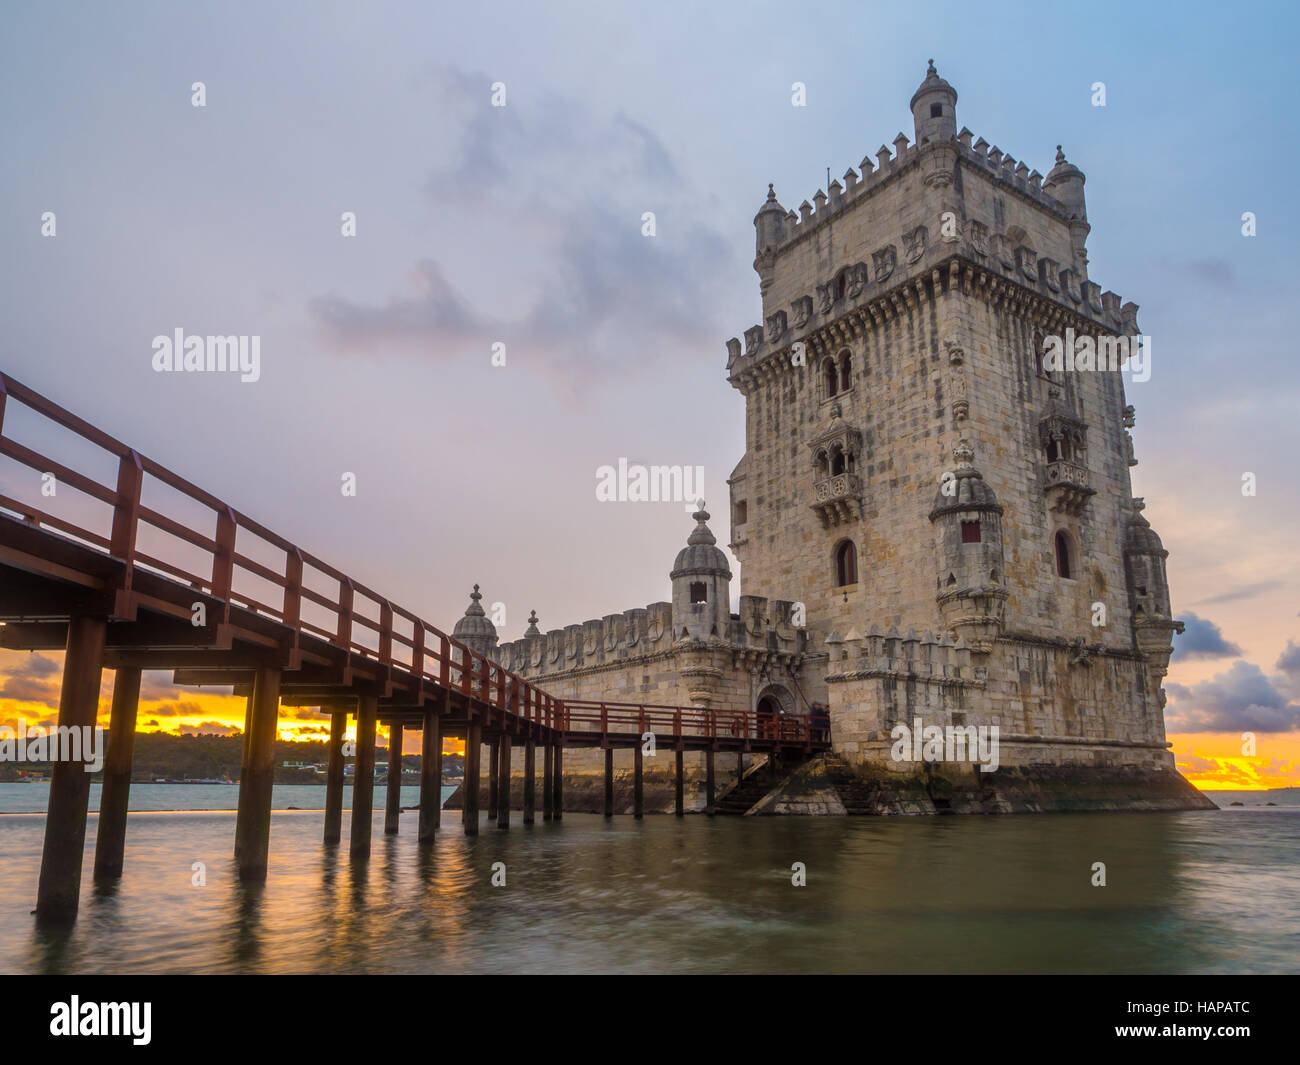 Torre de Belem on the bank of Tagus river in Lisbon, Portugal, at sunset. - Stock Image